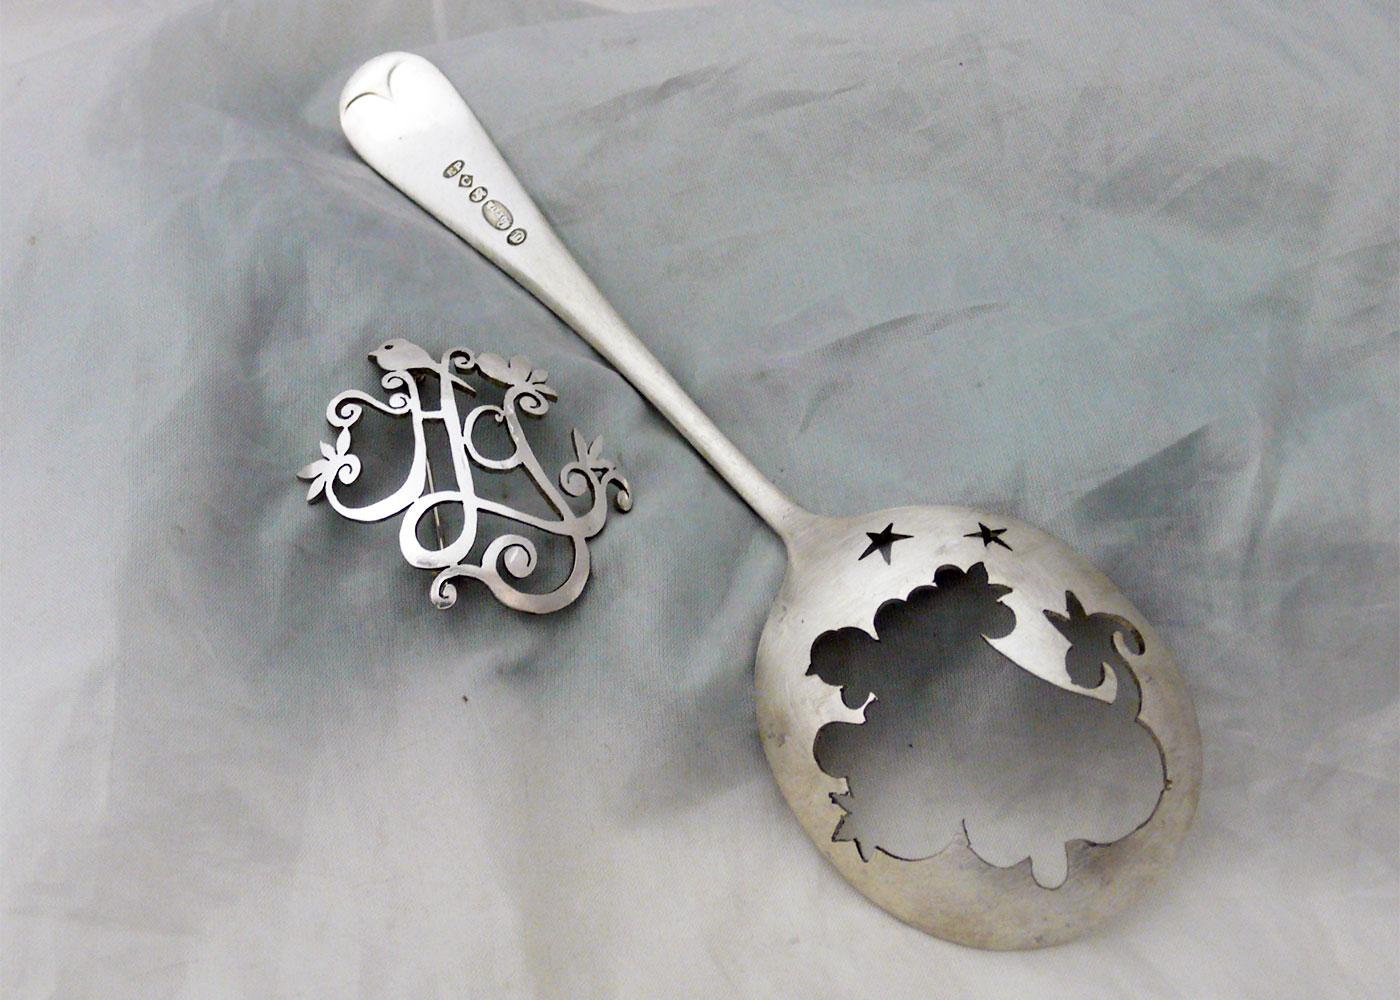 Tweet brooch - handmade and upcycled cutlery